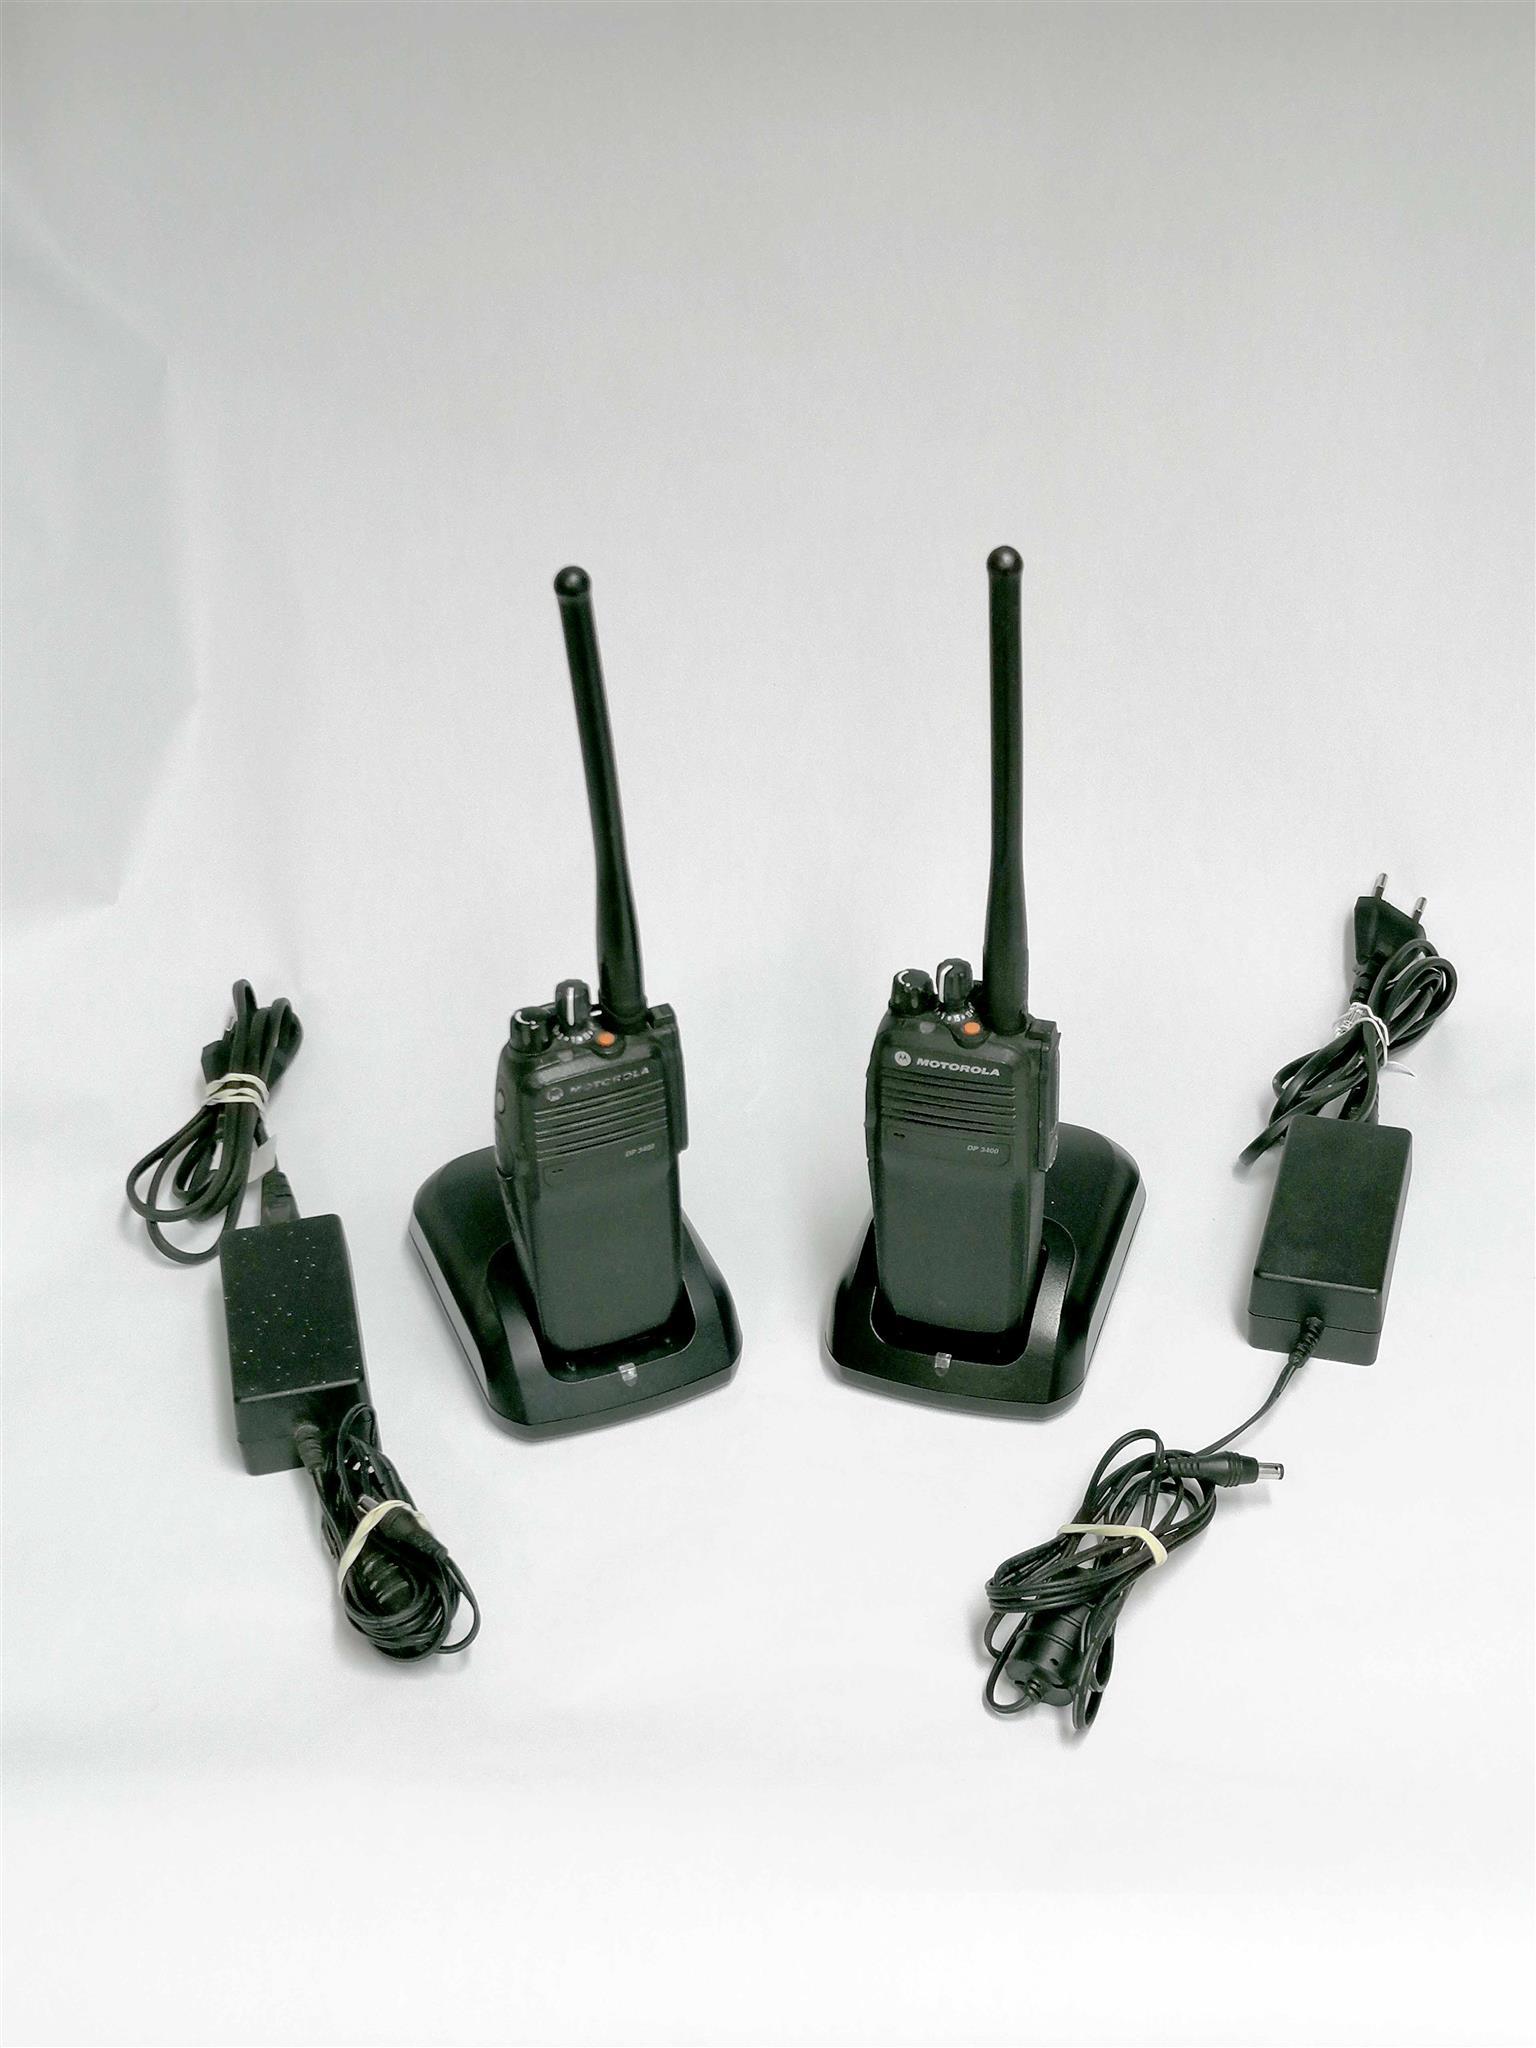 Motorola DP3400 Portable Digital Two Way Radio MOTOTRBO